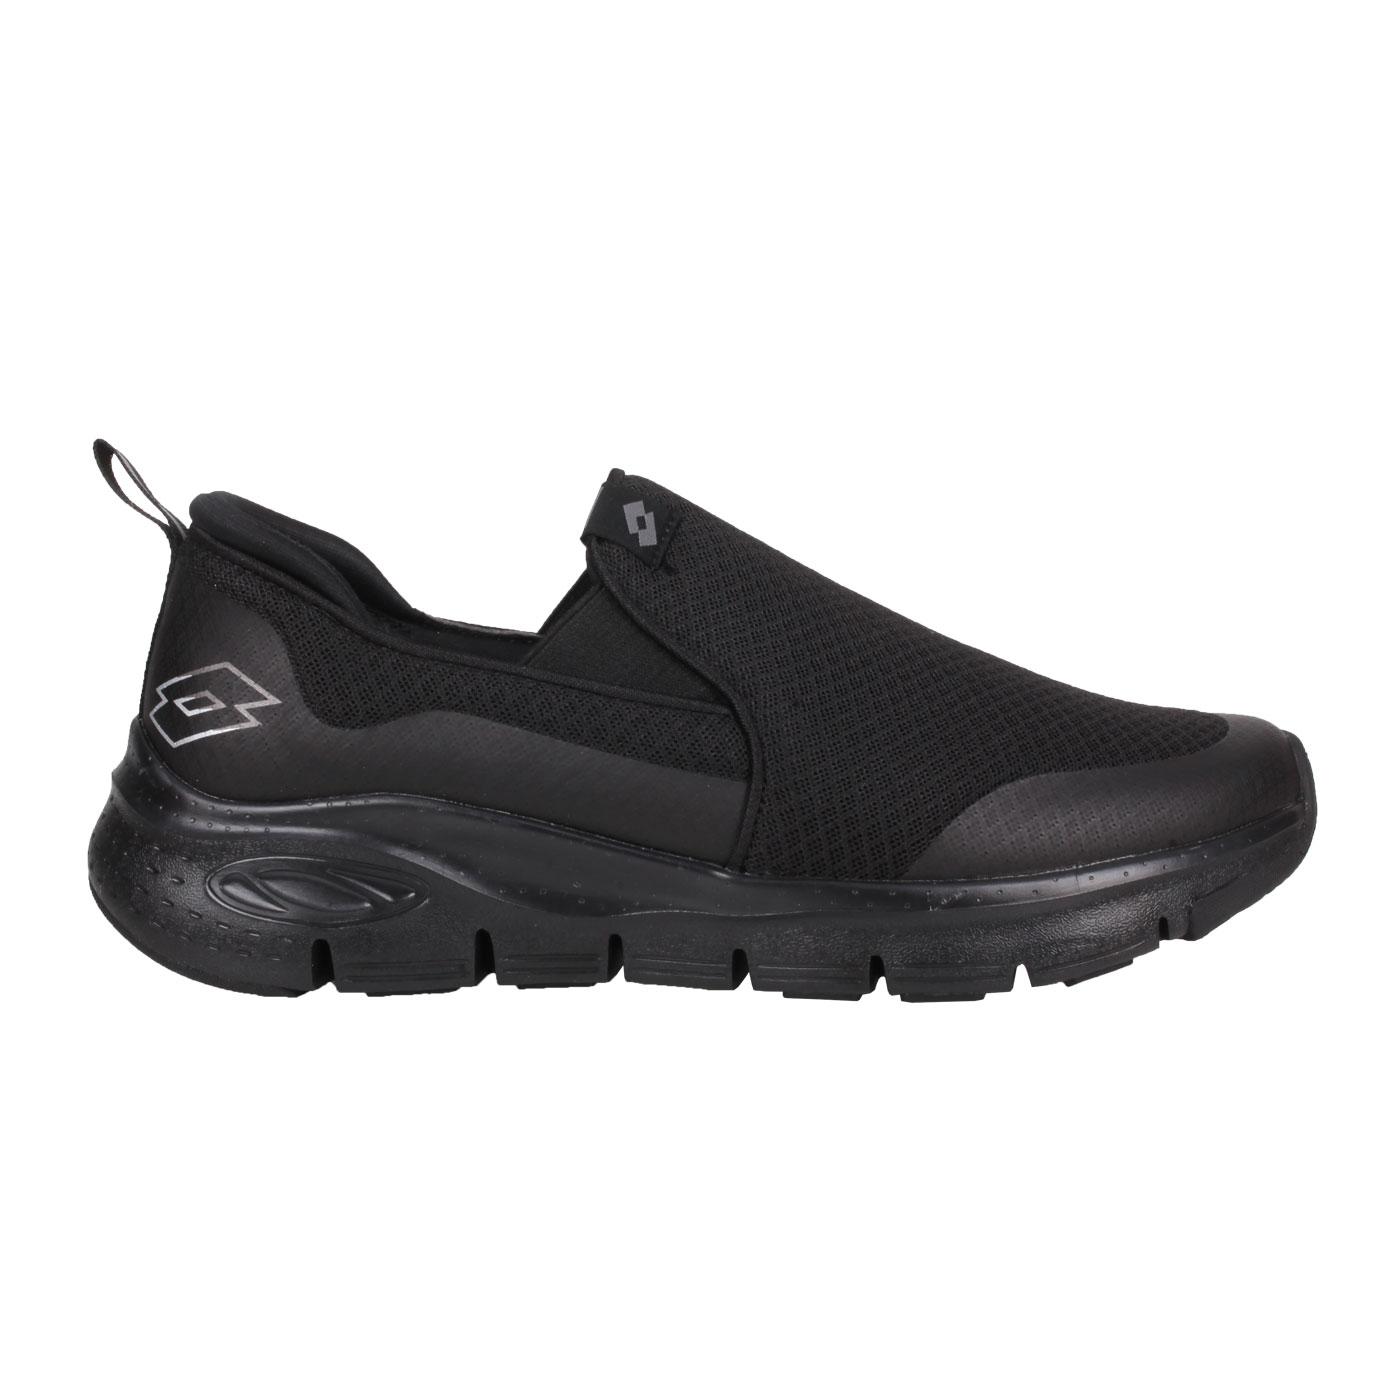 LOTTO 男款透氣健步鞋 LT1AMR3520 - 黑銀